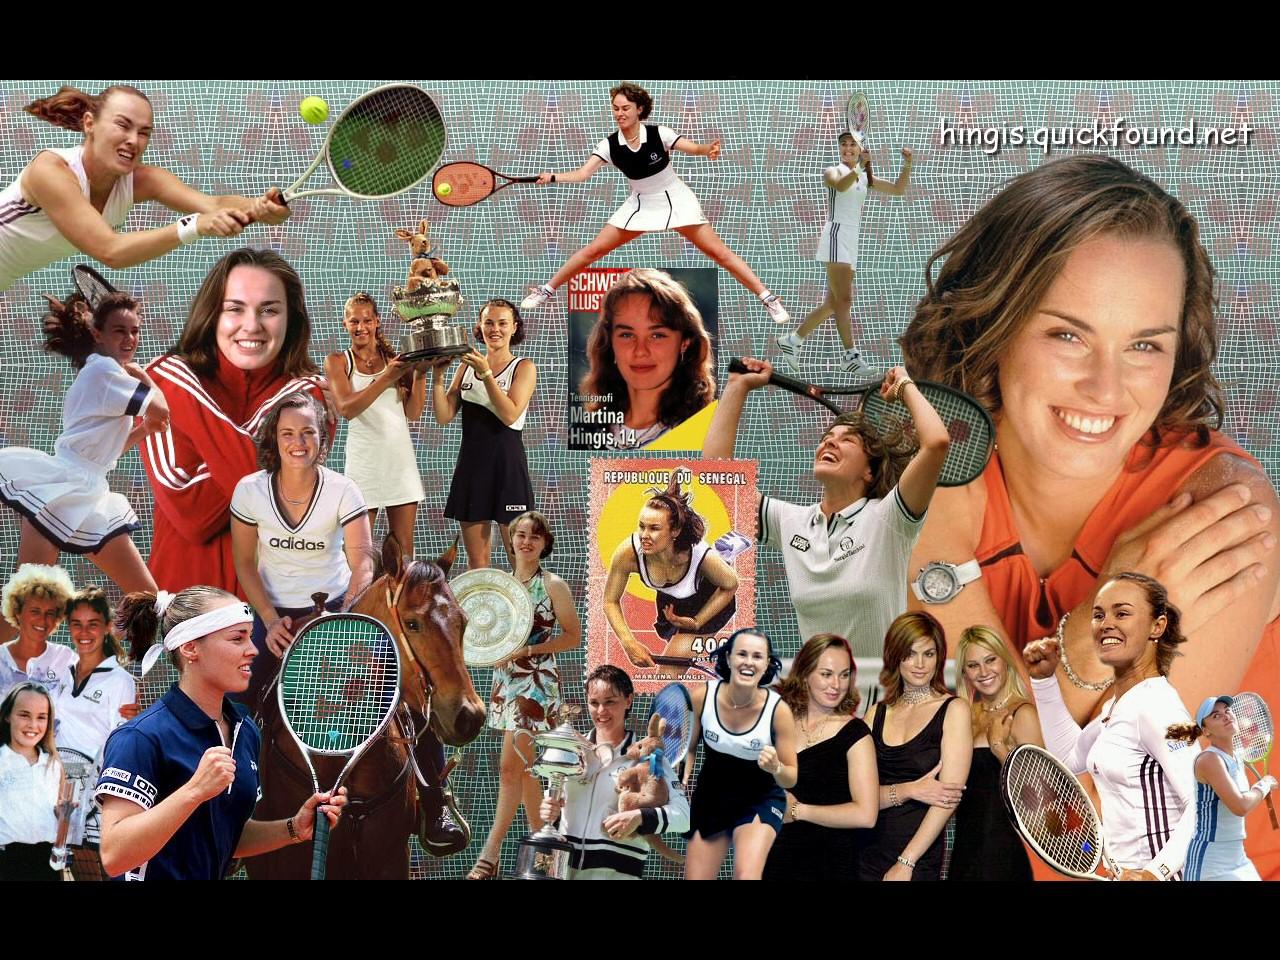 Martina Hingis Wallpaper QuickSports 1280x960